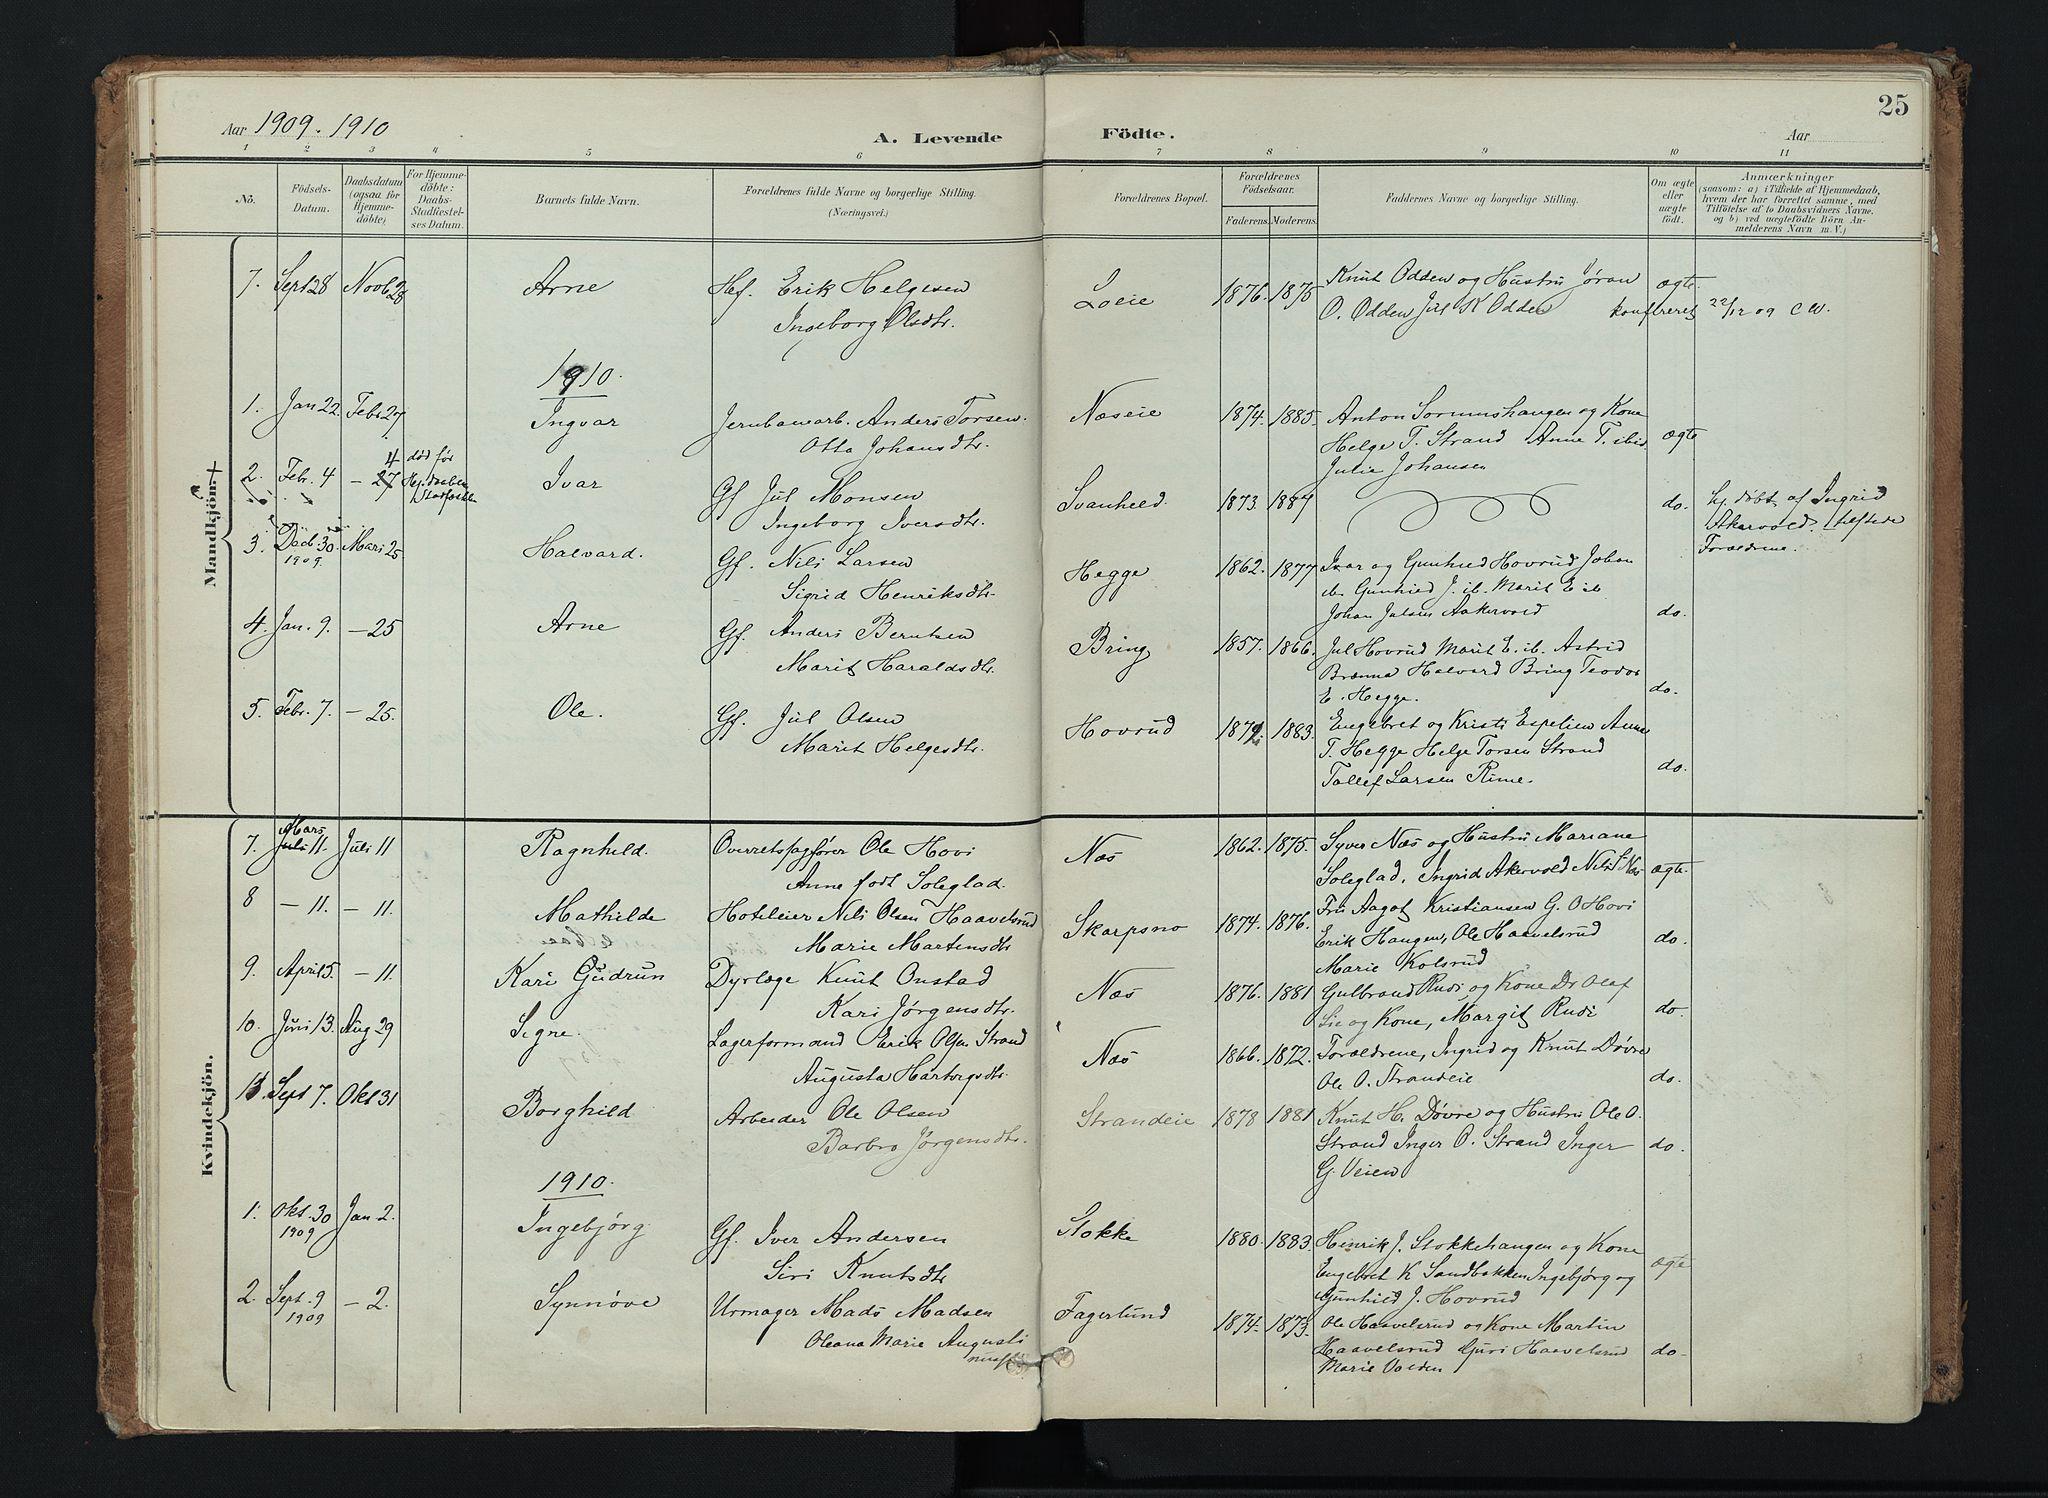 SAH, Nord-Aurdal prestekontor, Ministerialbok nr. 16, 1897-1925, s. 25